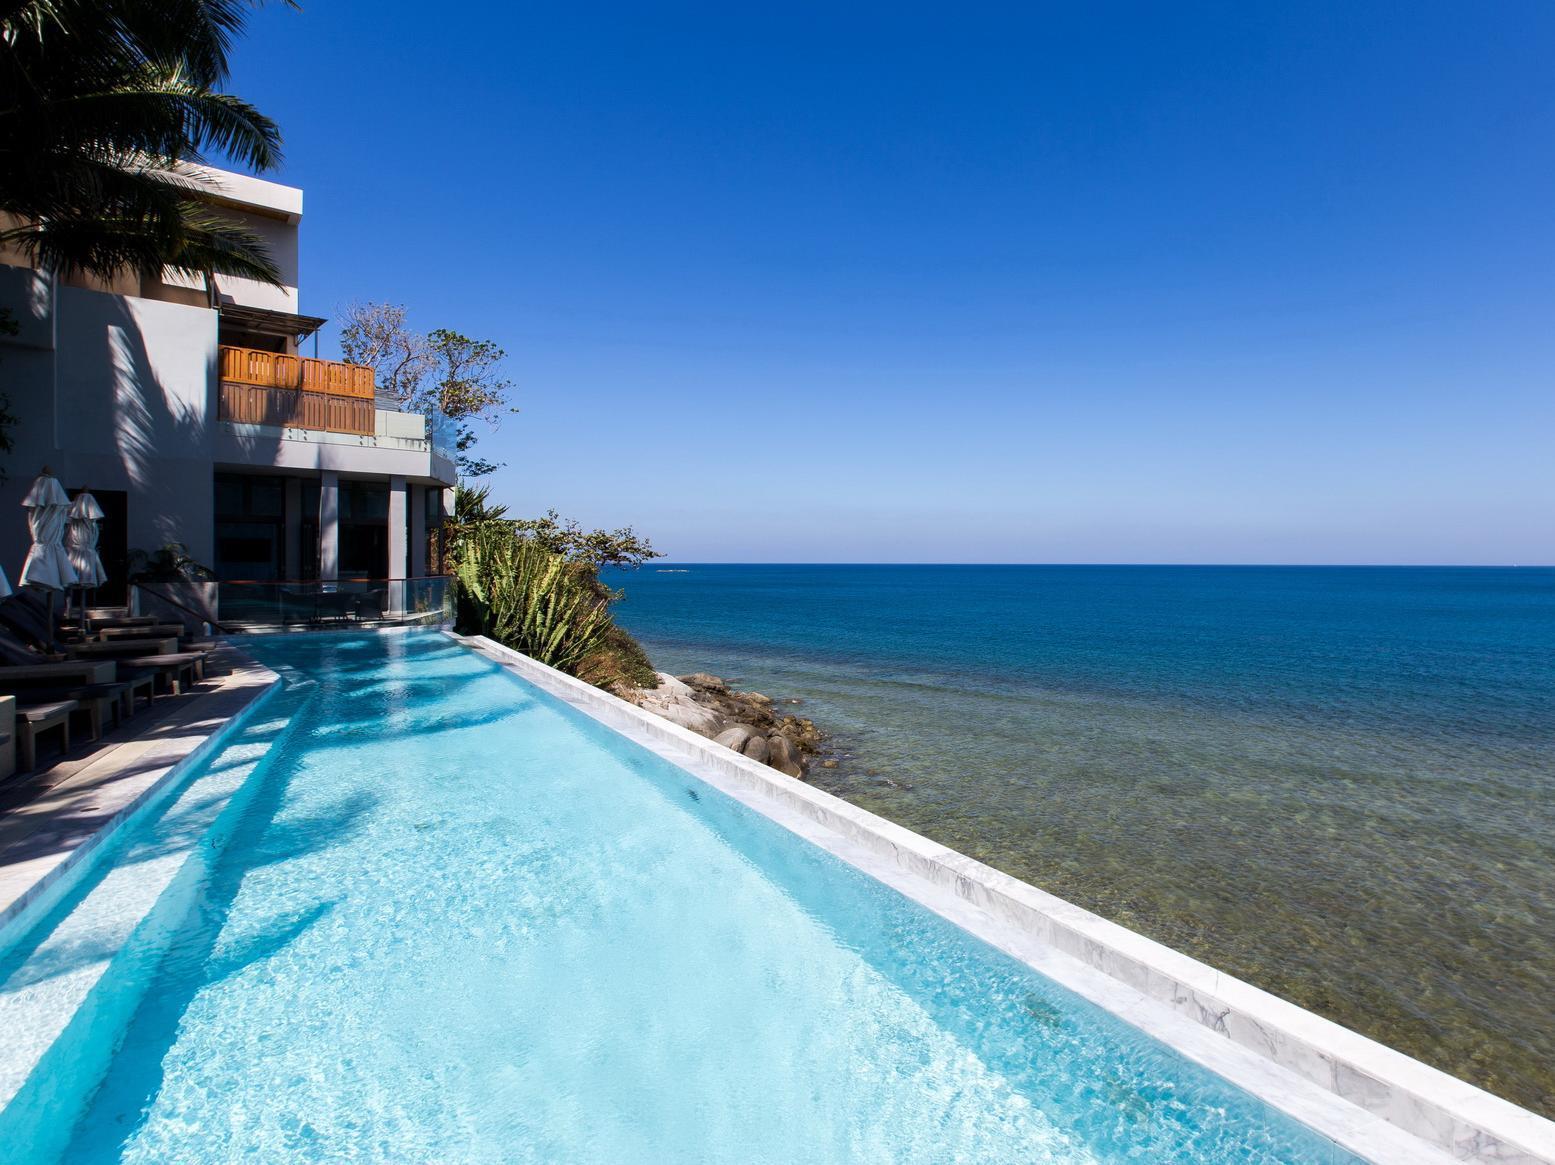 Cape Sienna Phuket Hotel and Villas12